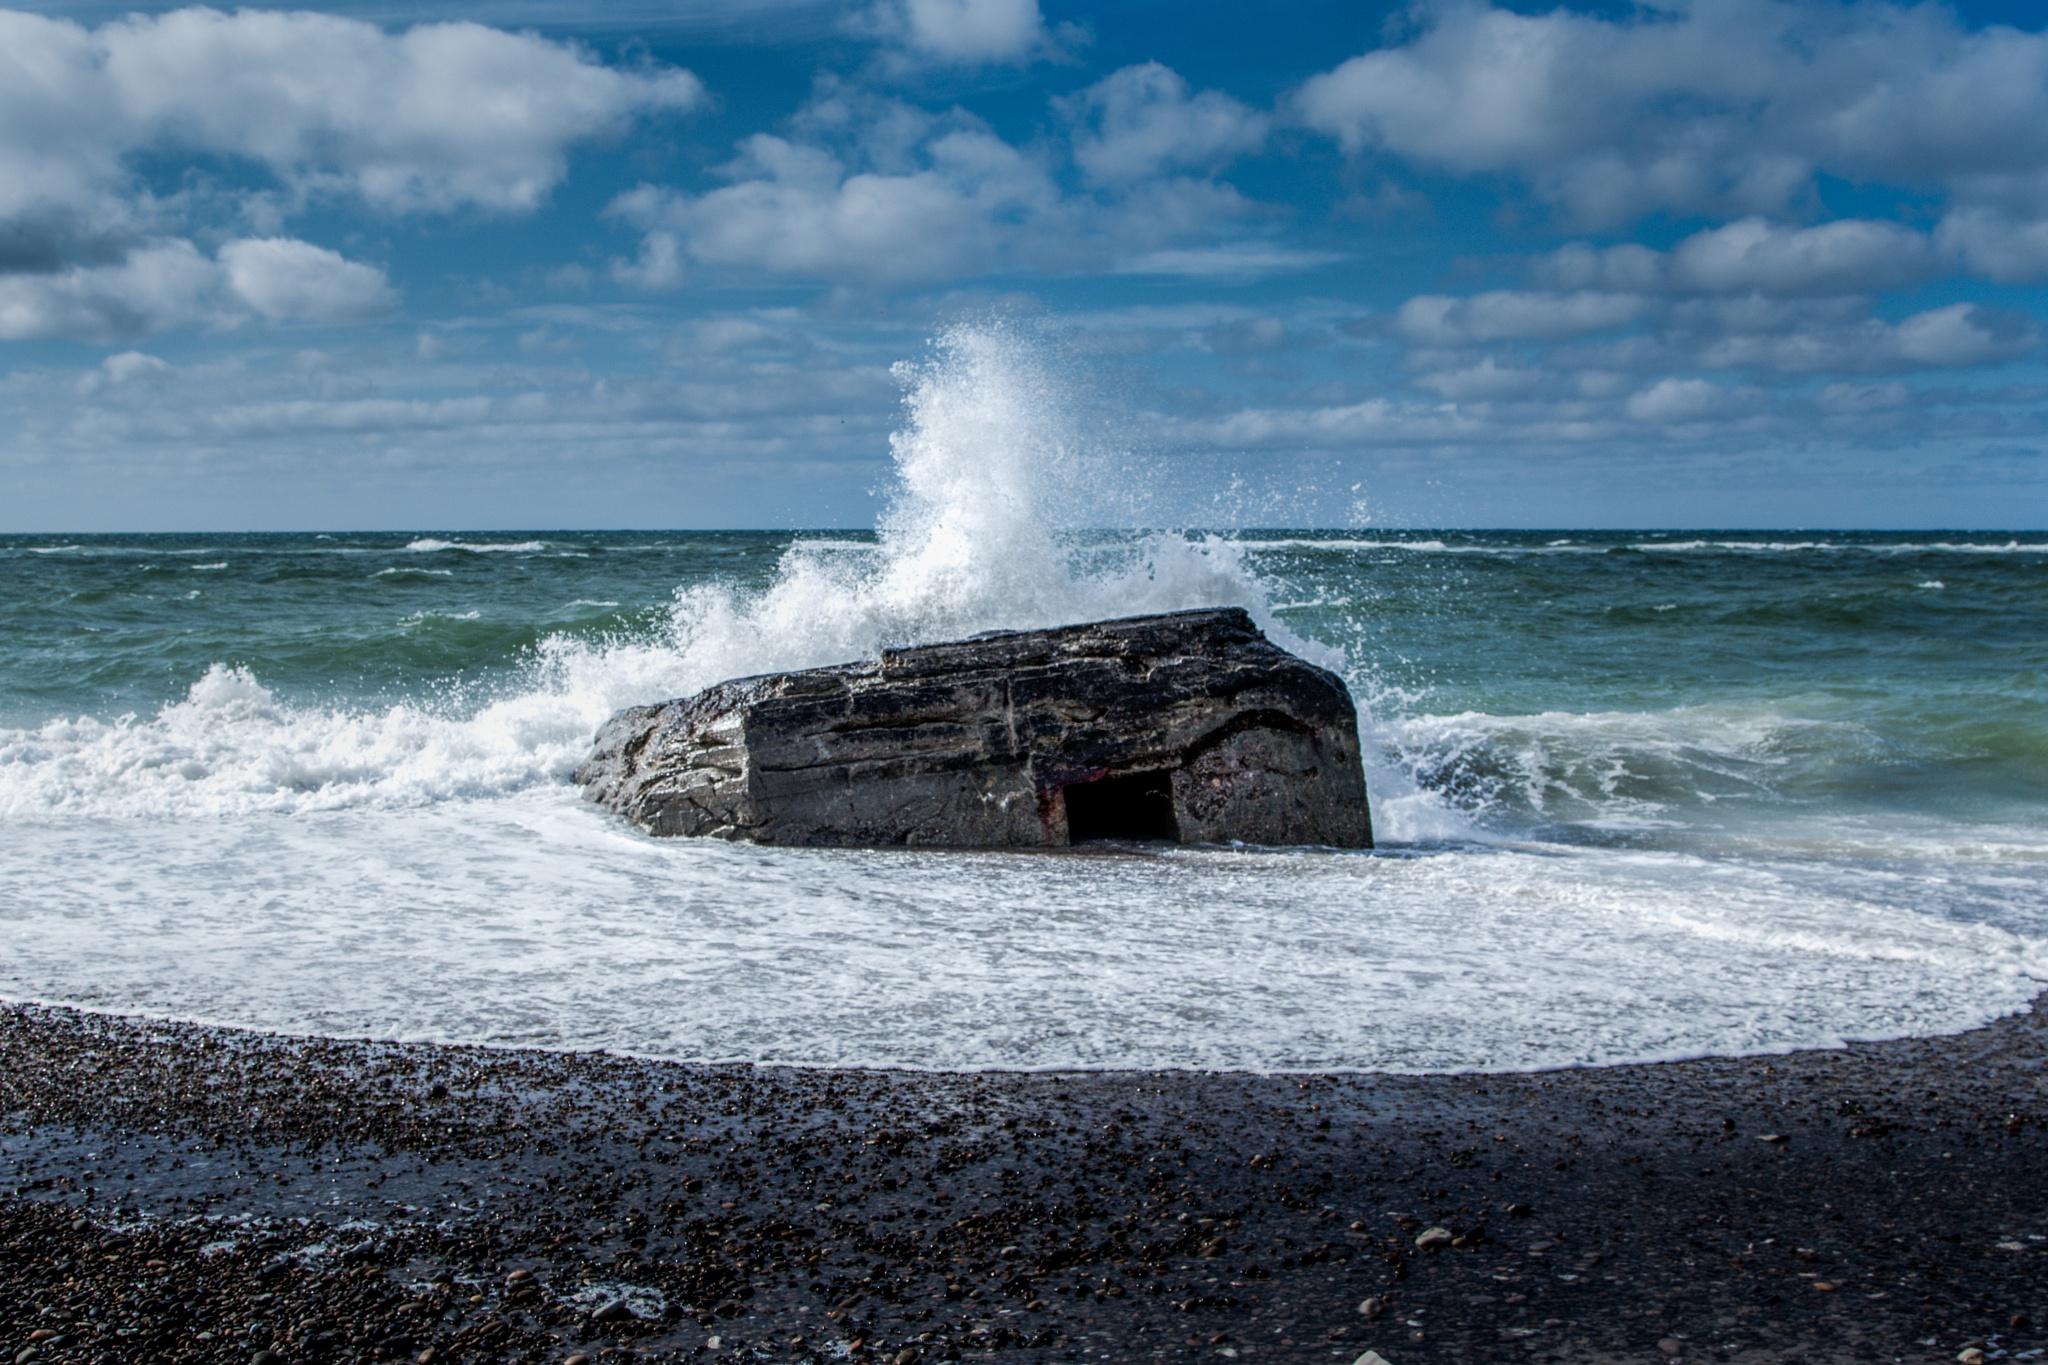 Lild Beach Denmark by Michael B. Rasmussen